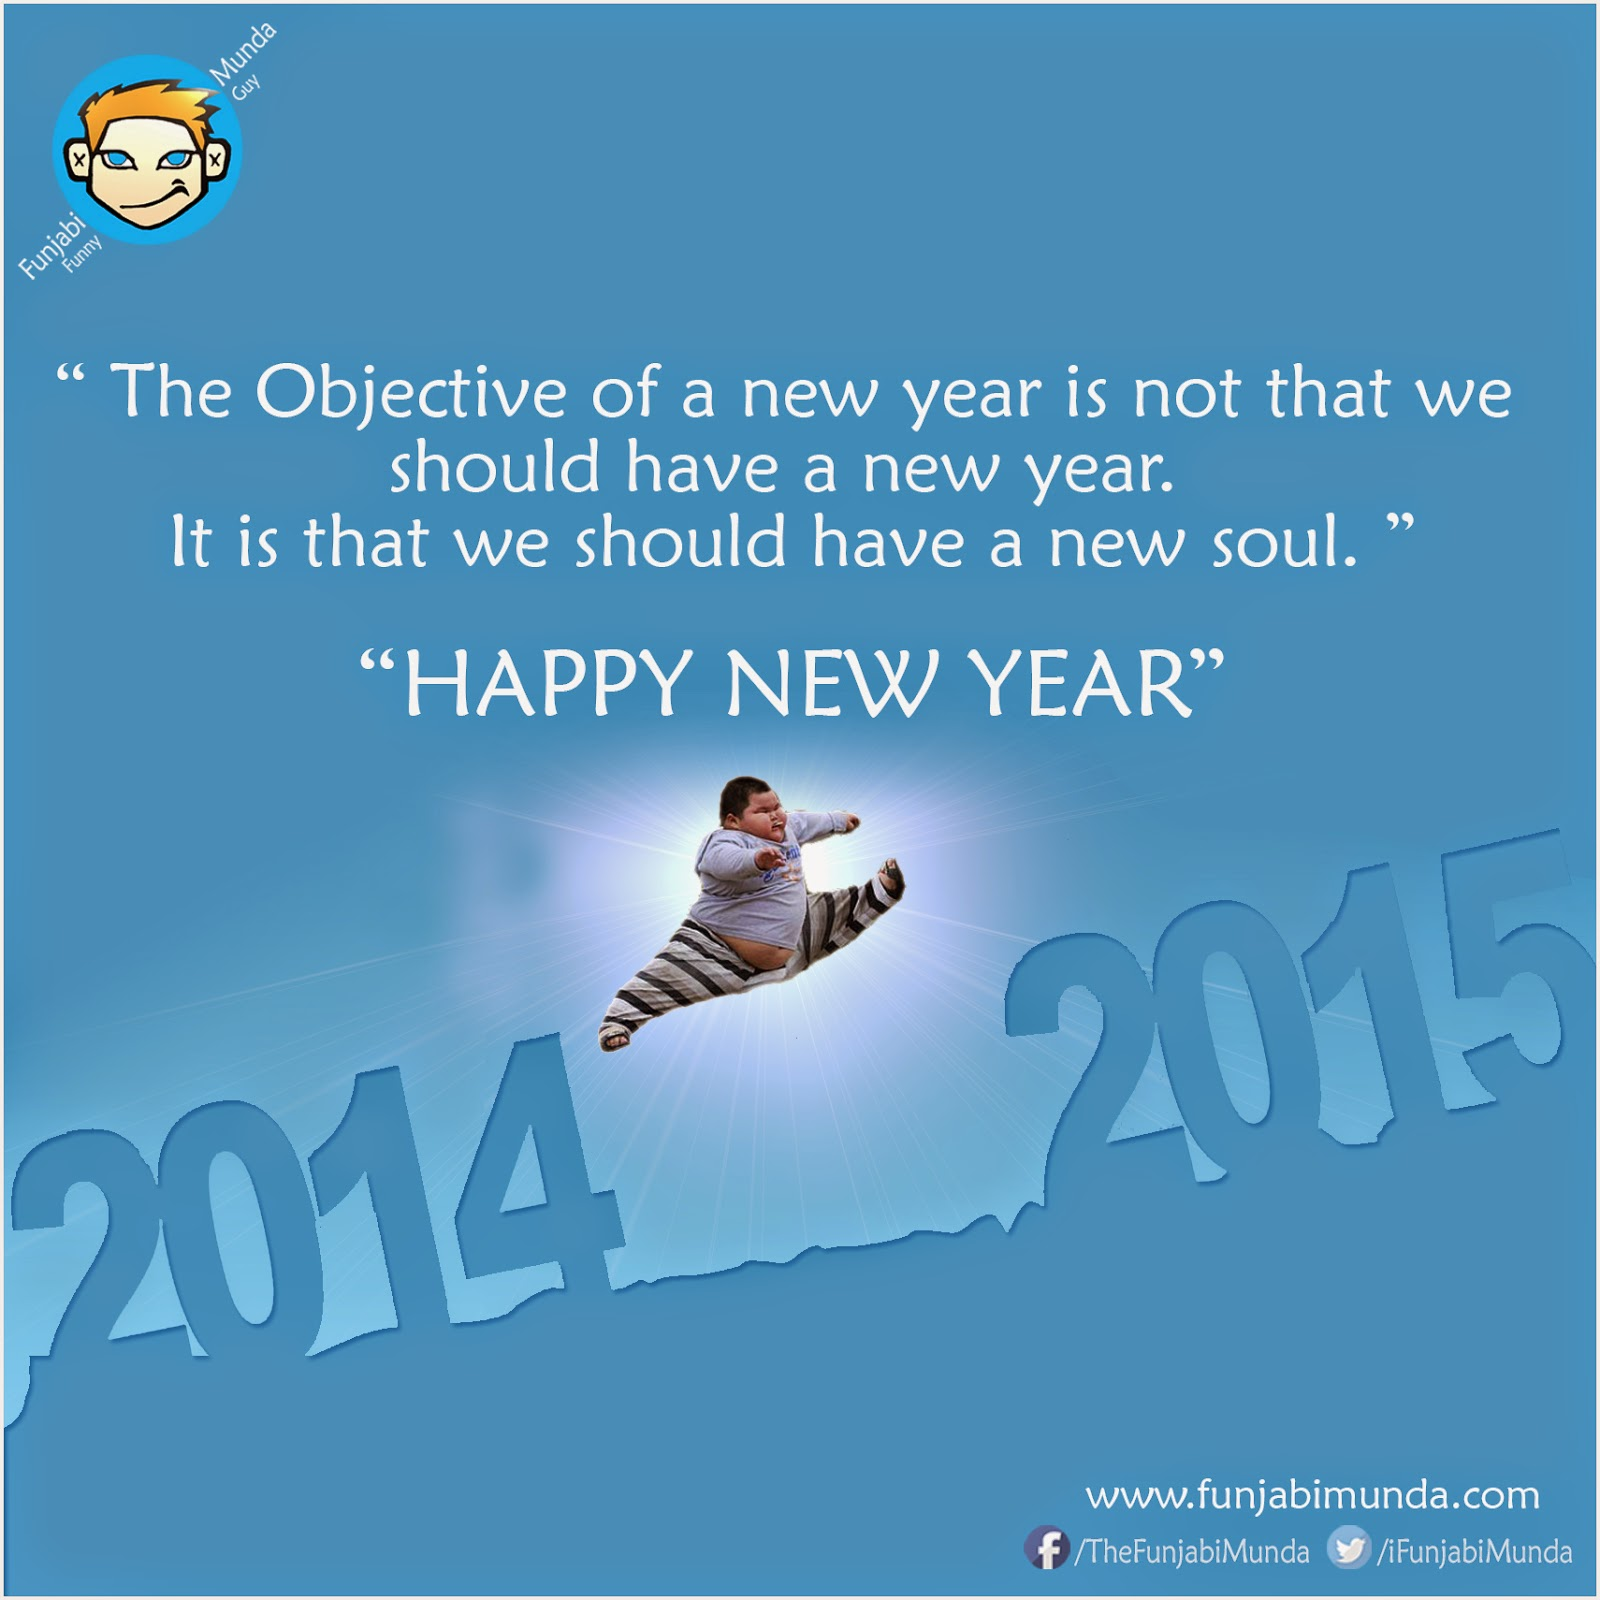 Innovative Calendar 2015 Funjabi Munda